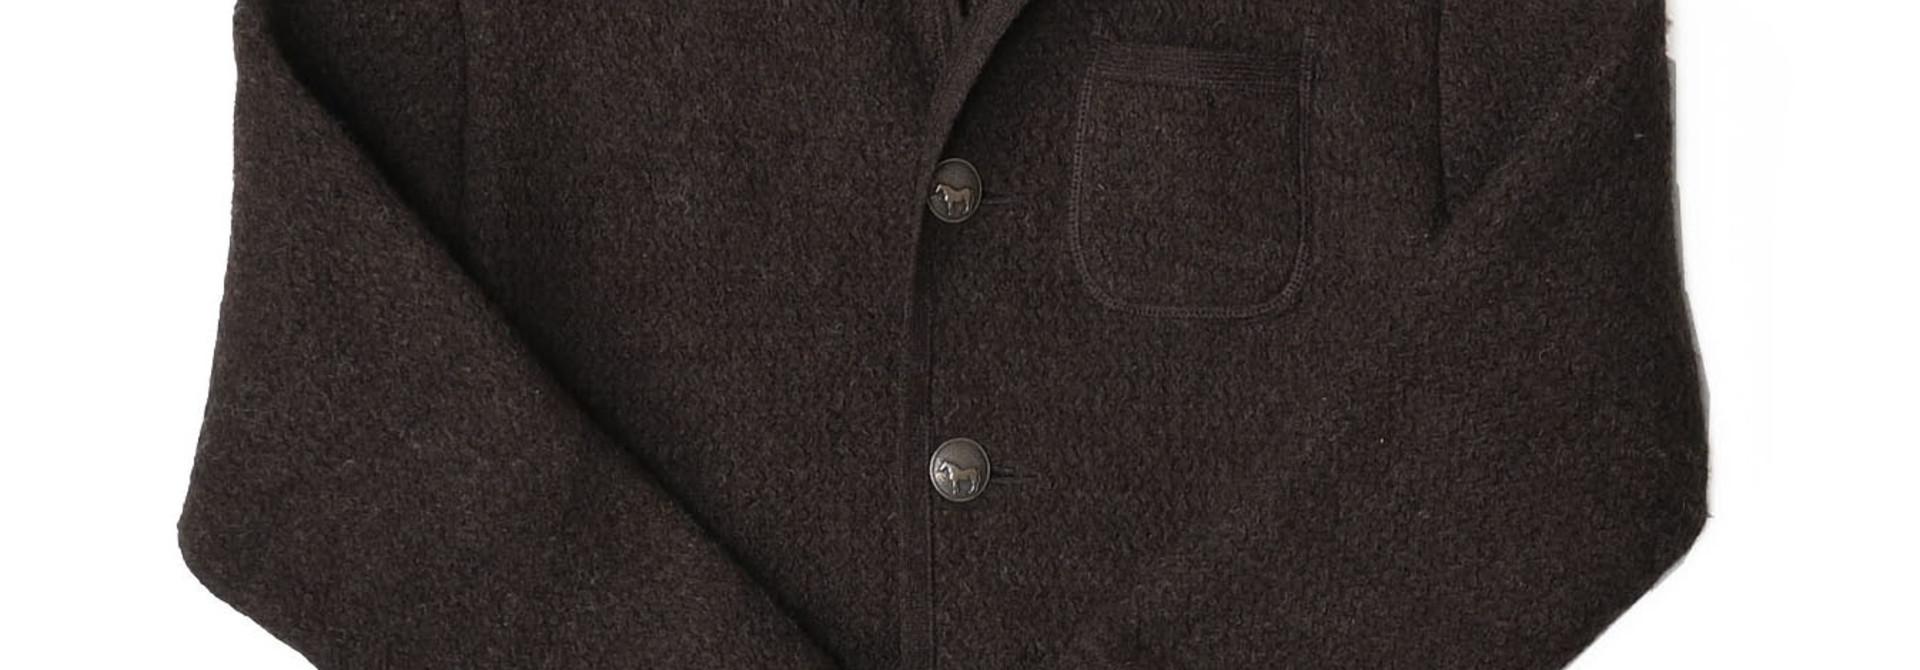 Cotton Shetland 908 Tyrolean Jacket